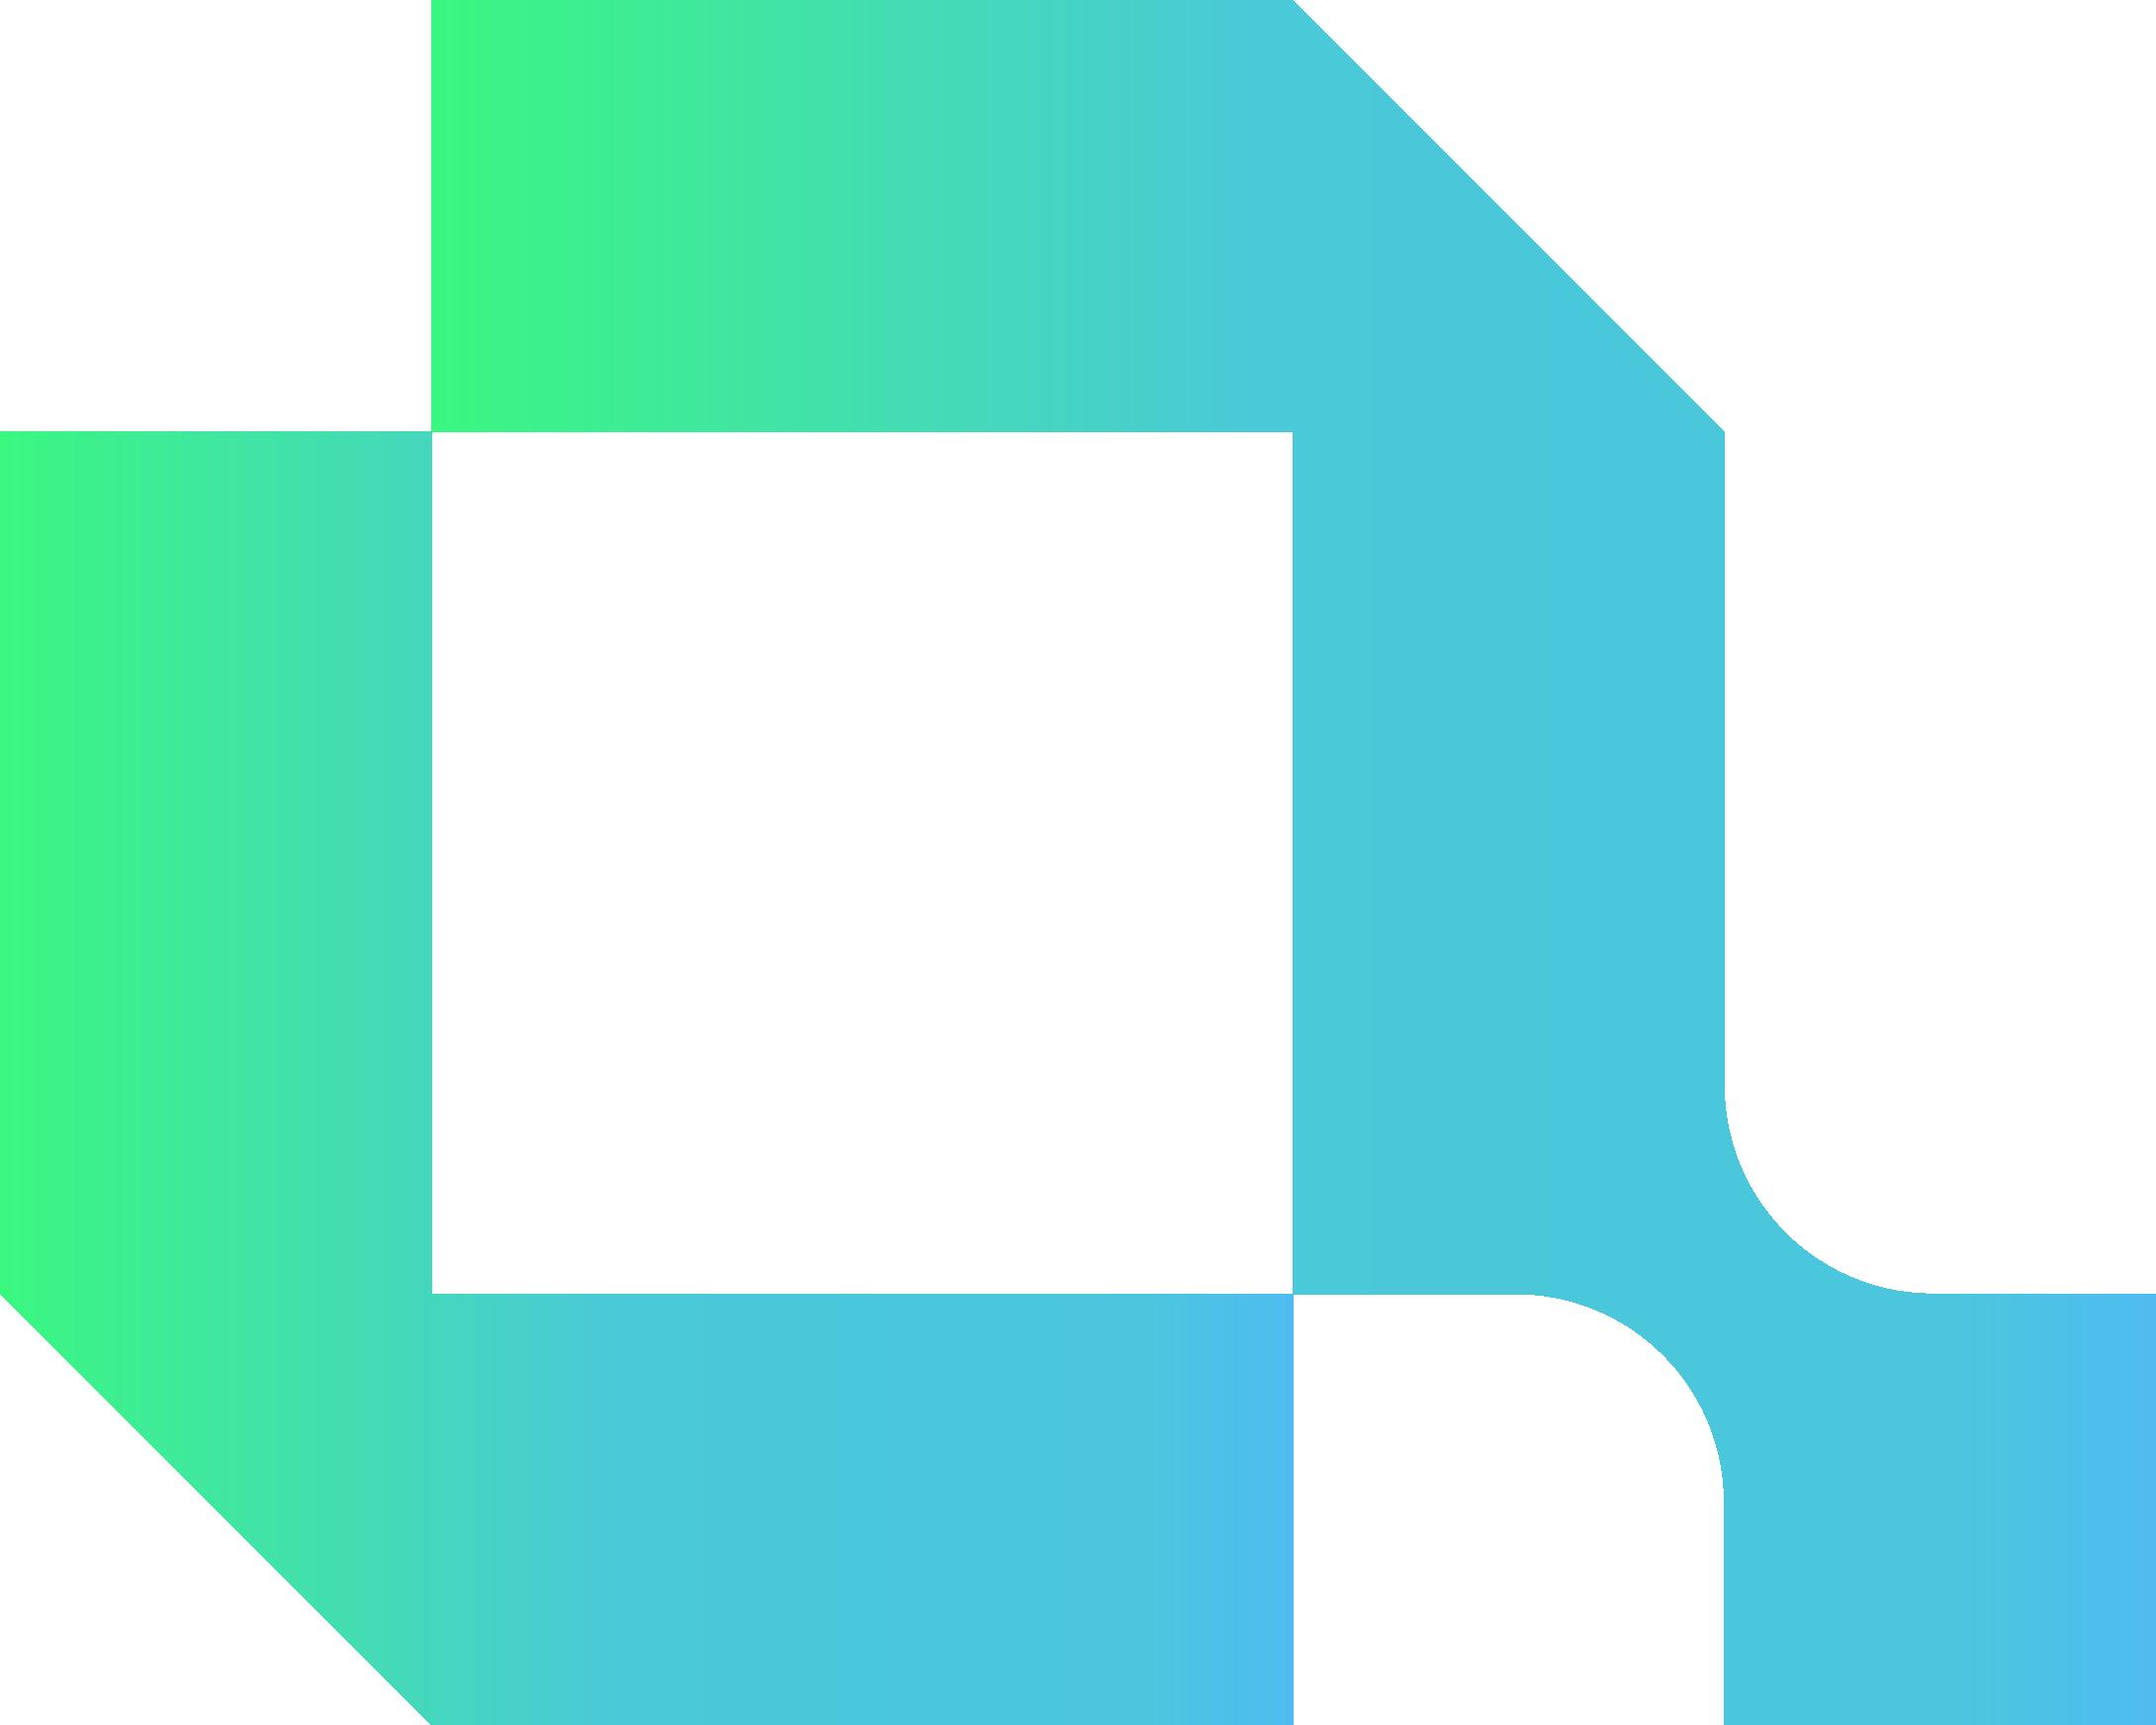 Quartolio - The Insight Cloudf or R&D